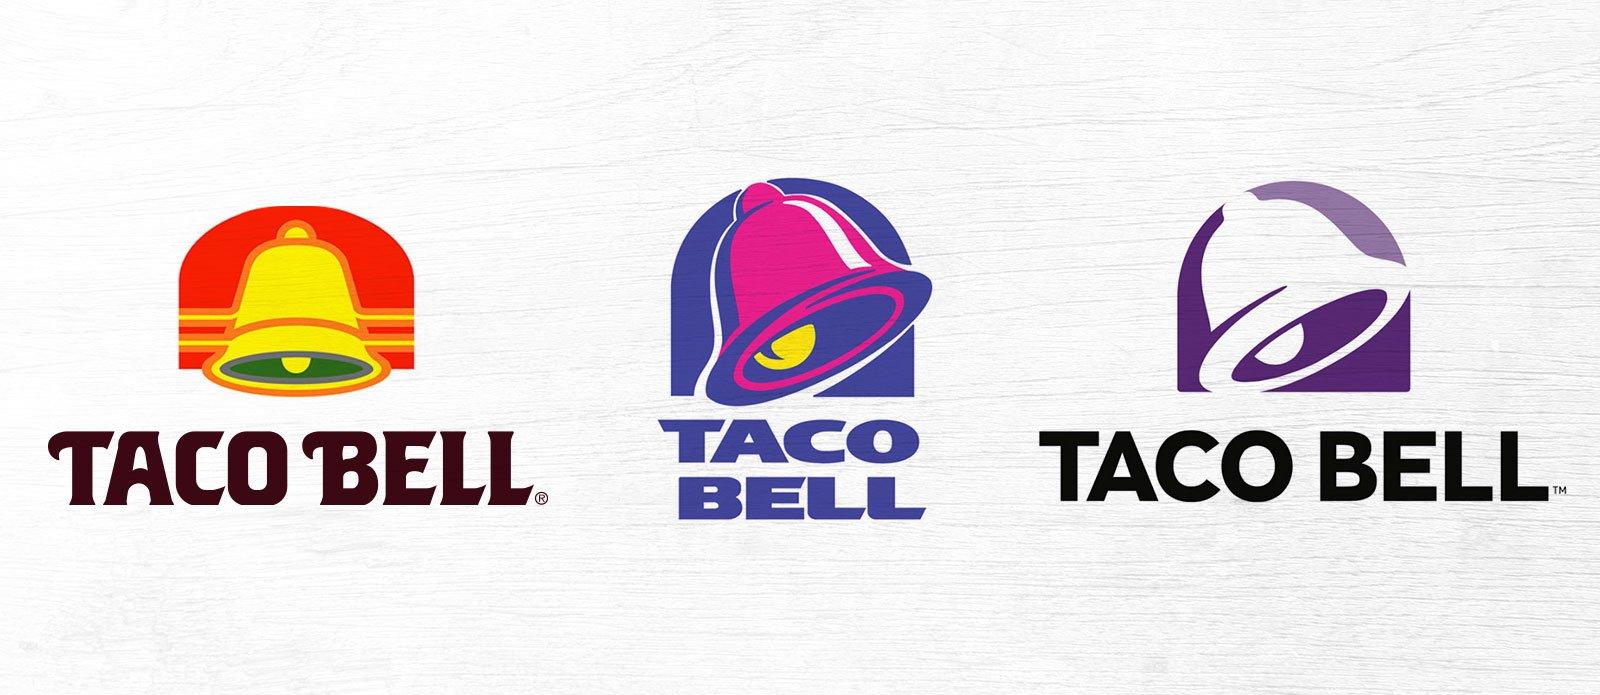 History of the Taco Bell Logo